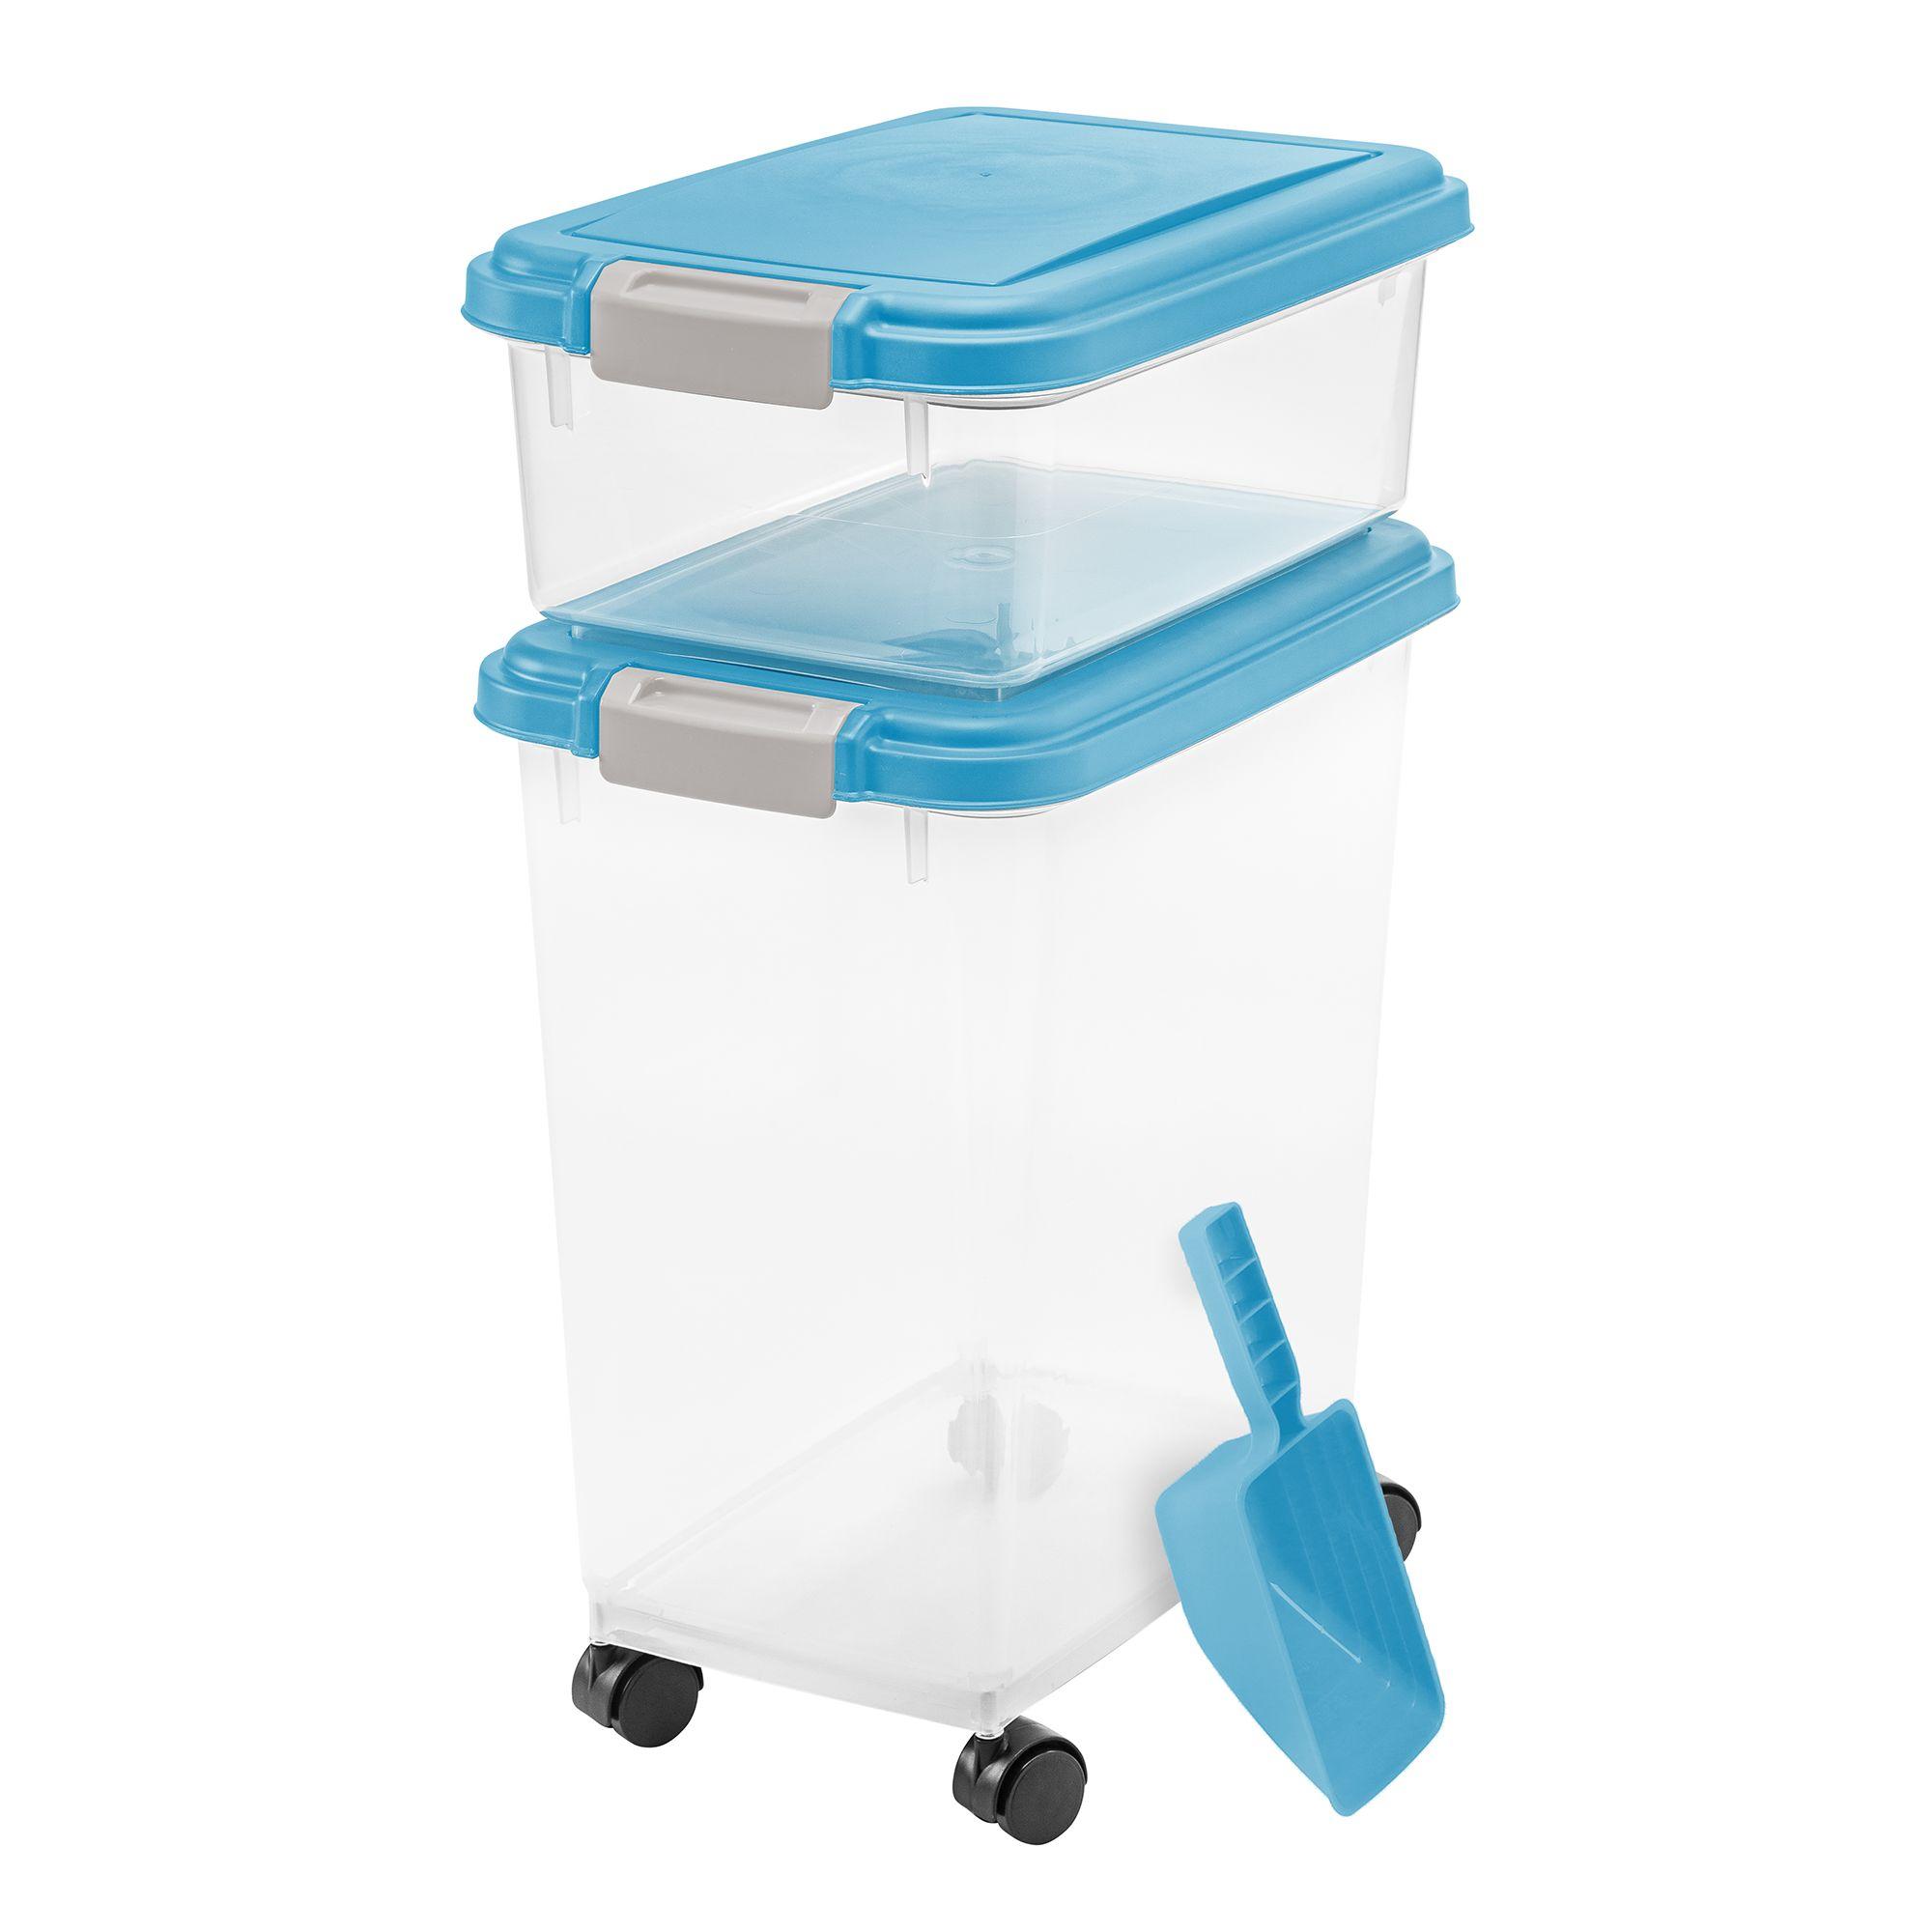 Iris Airtight Pet Food Storage Combo with Scoop, Blue Moon